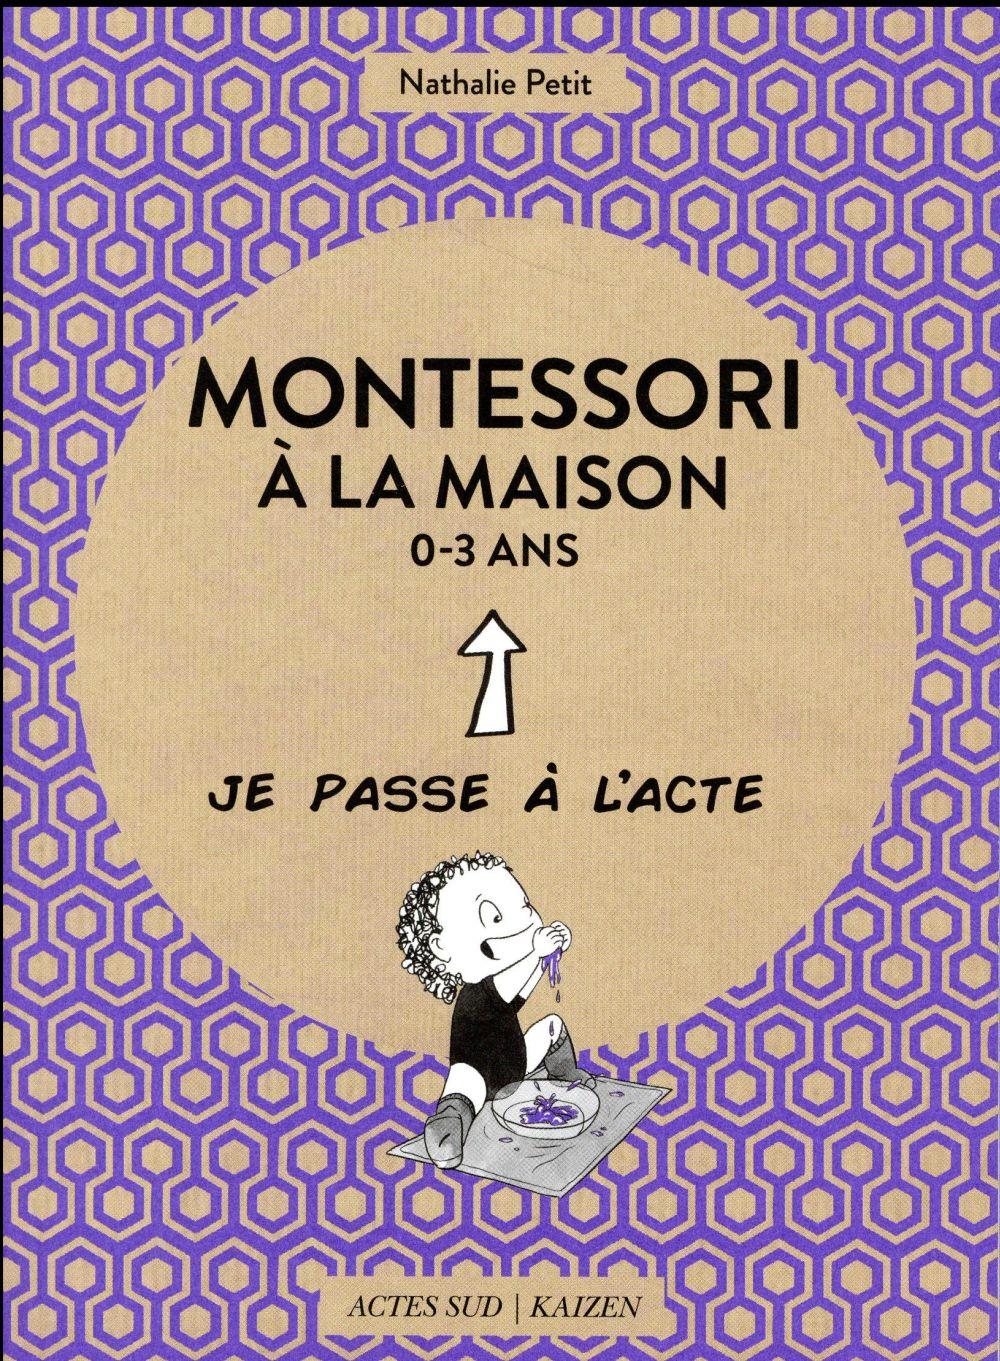 Montessori A La Maison ; 0-3 Ans